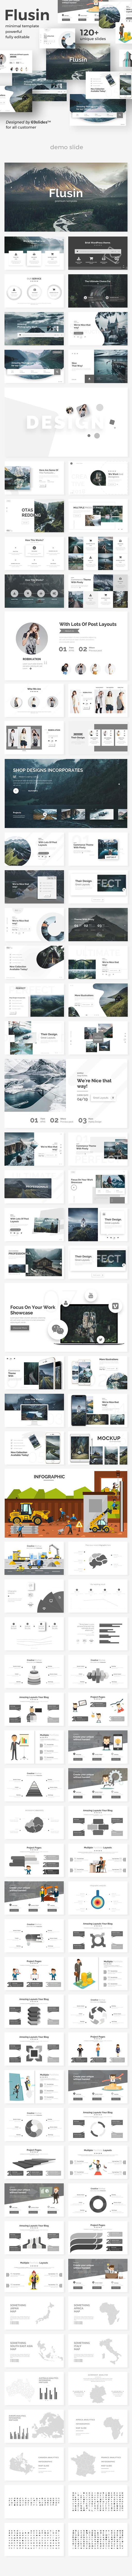 Flusin Creative Google Slide Template - Google Slides Presentation Templates